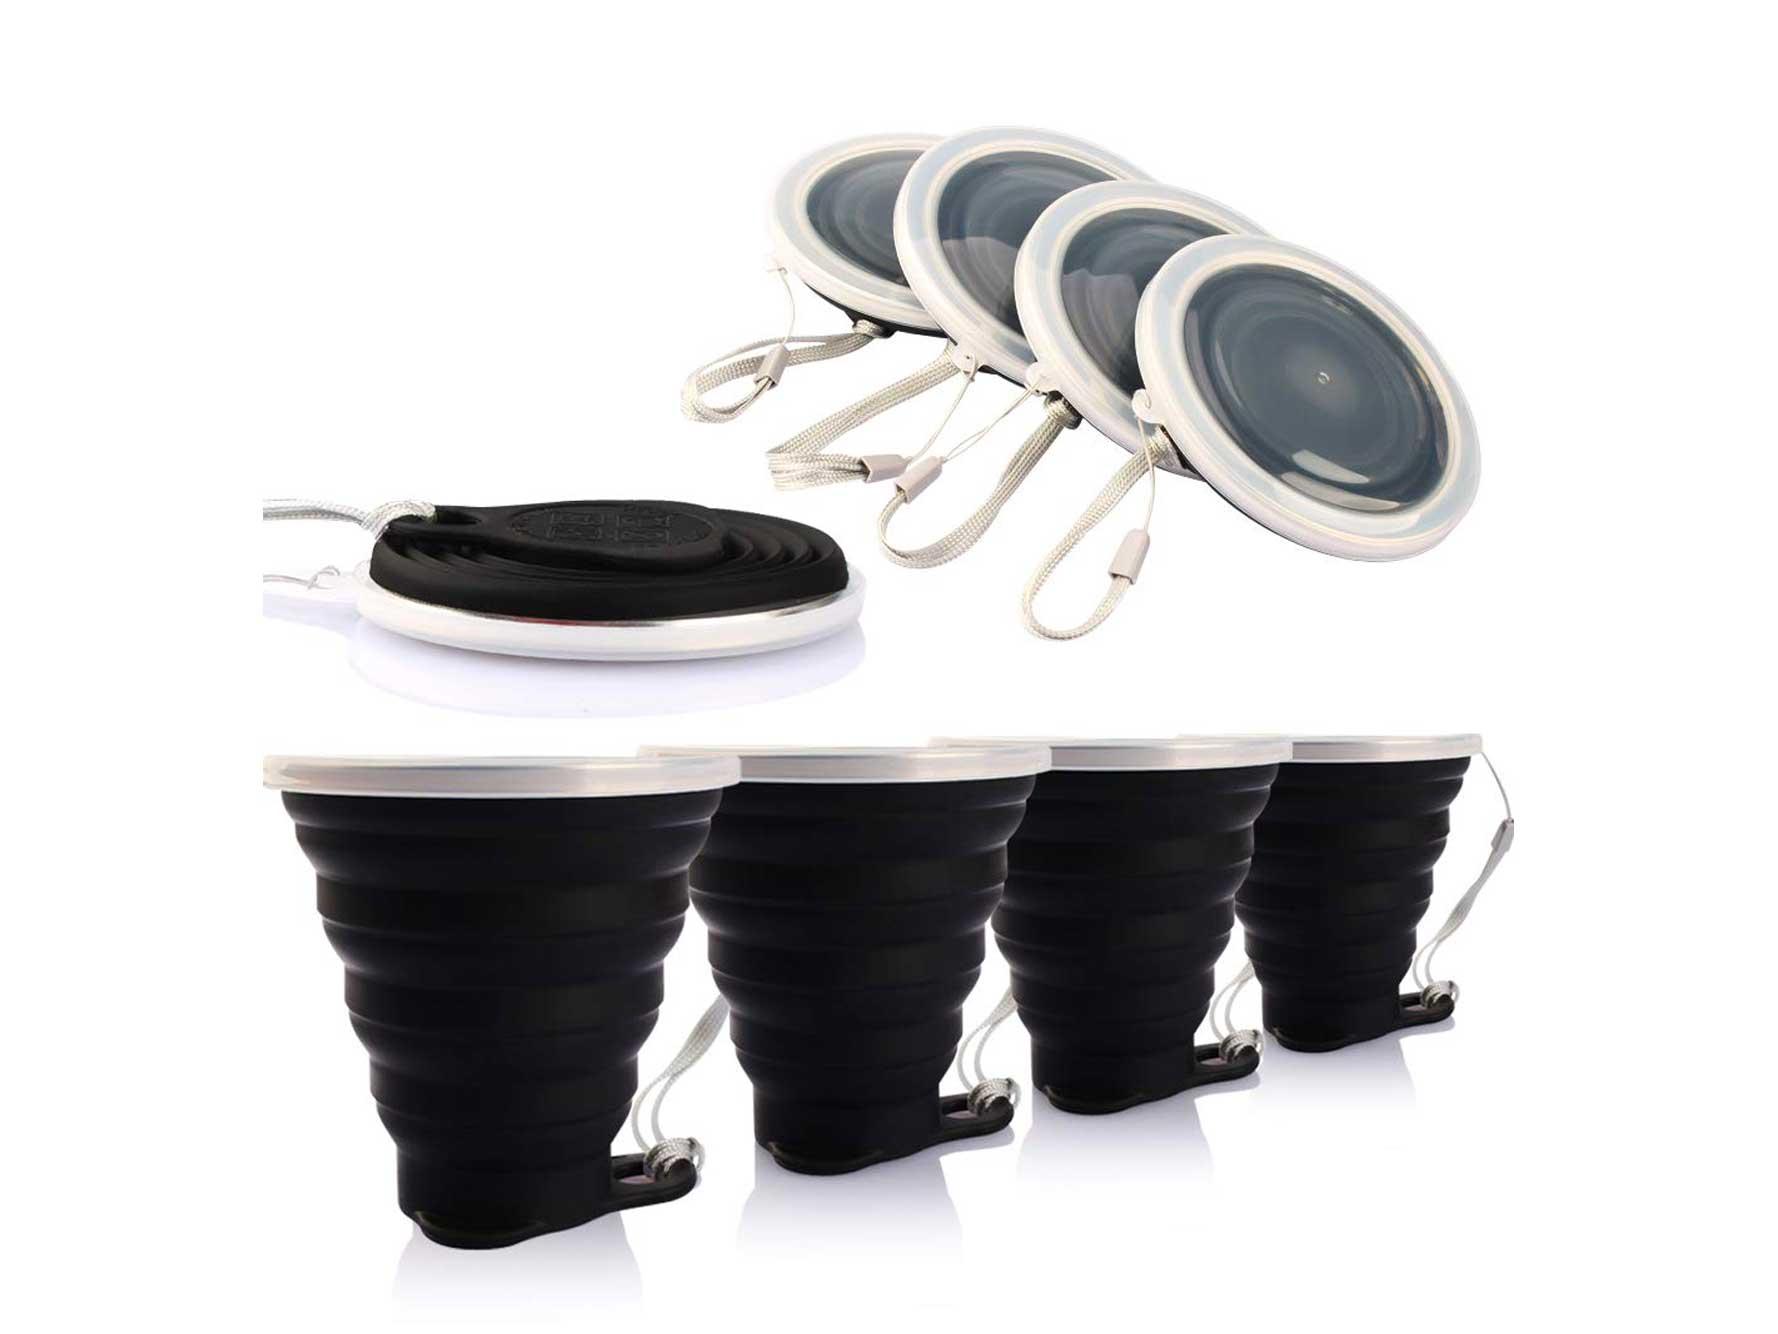 Silicone travel mugs